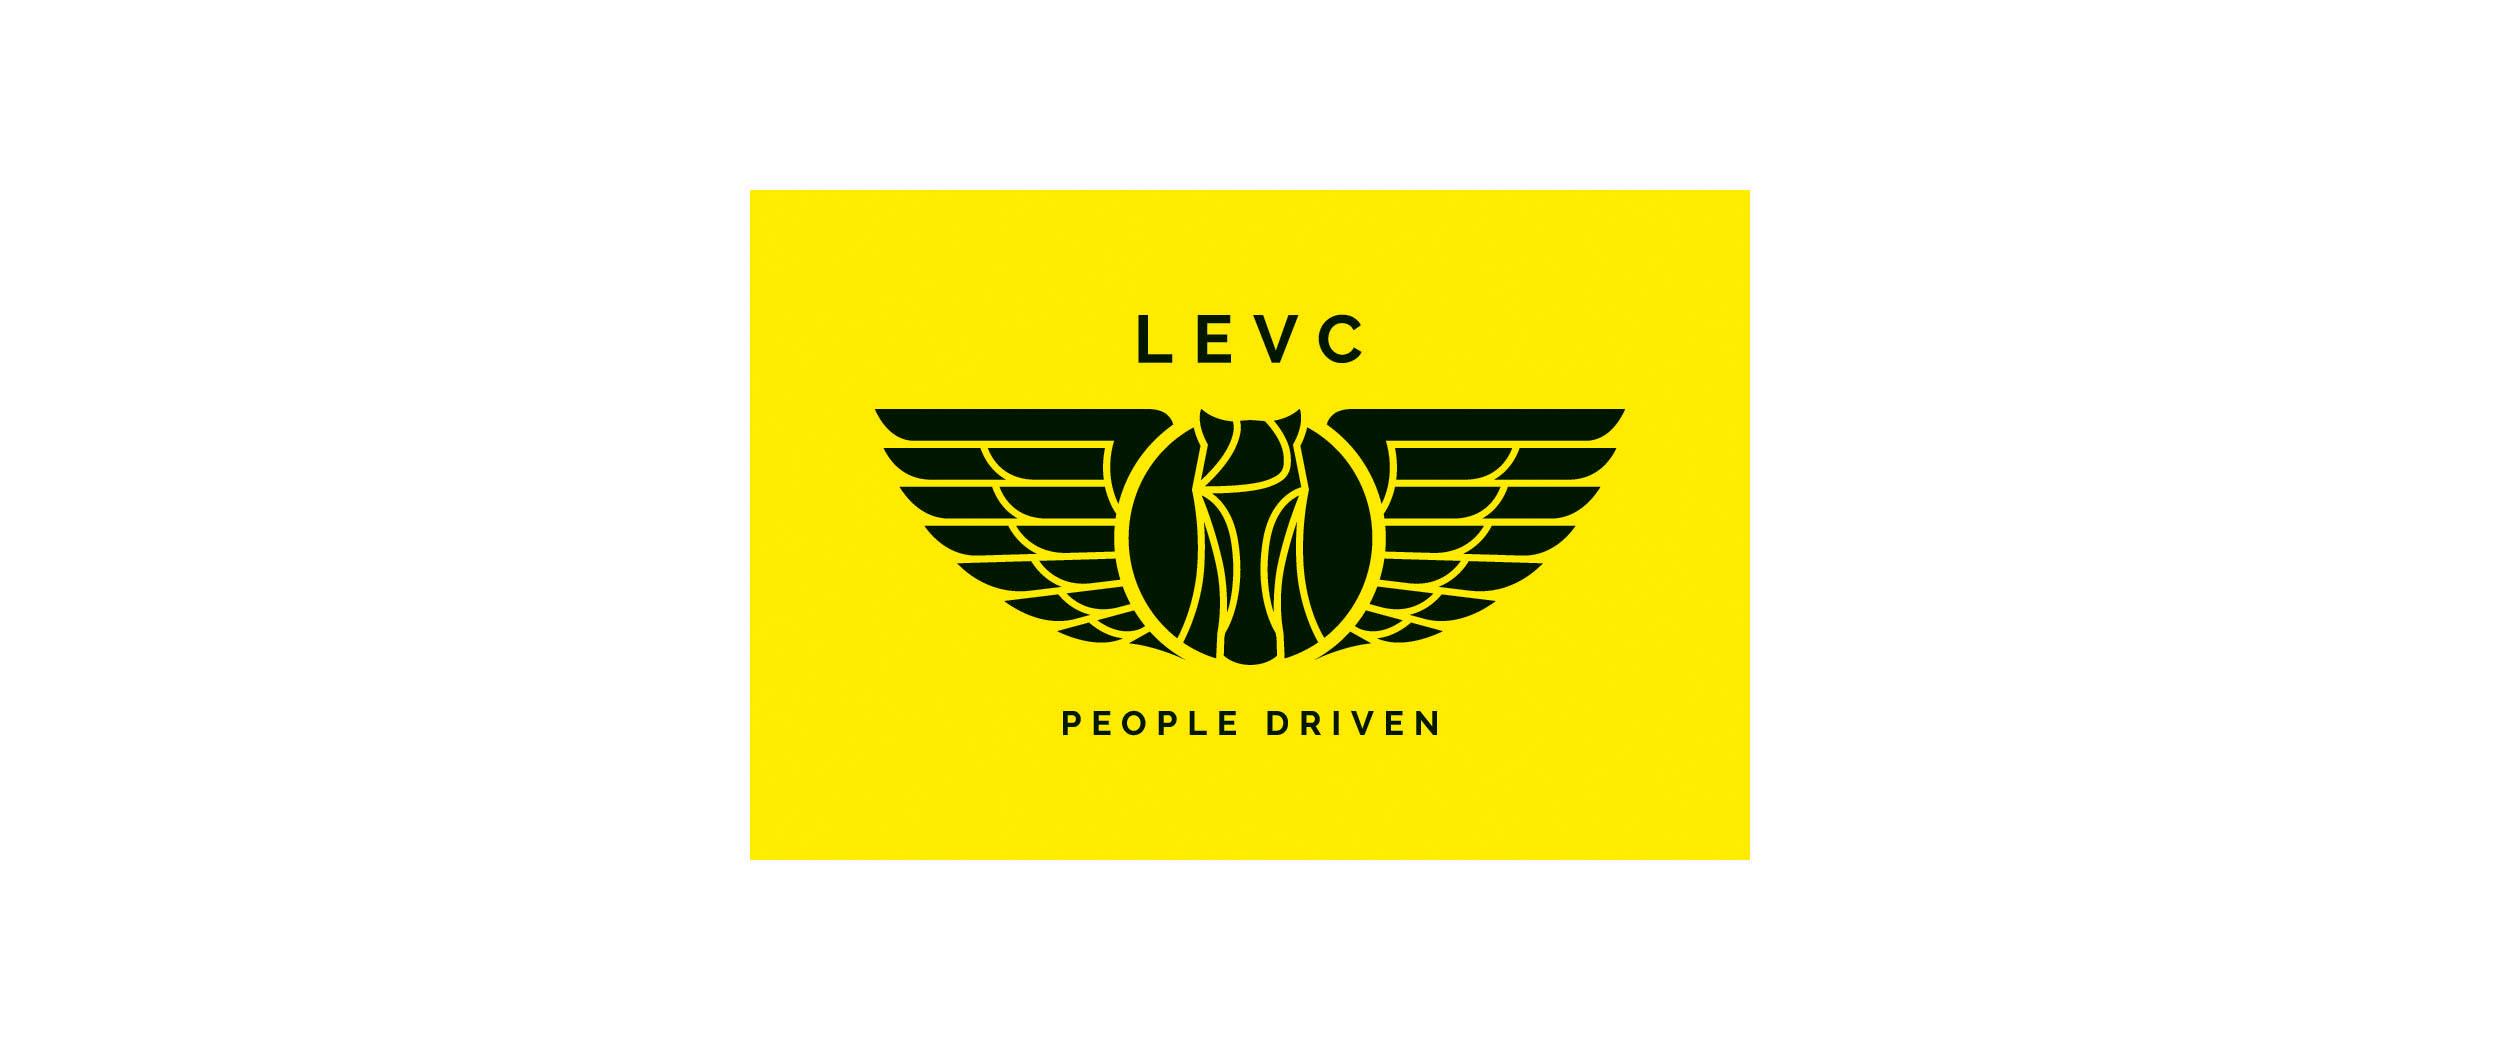 LEVC Name and Claim Lockup (Black on Yellow) copy.jpg